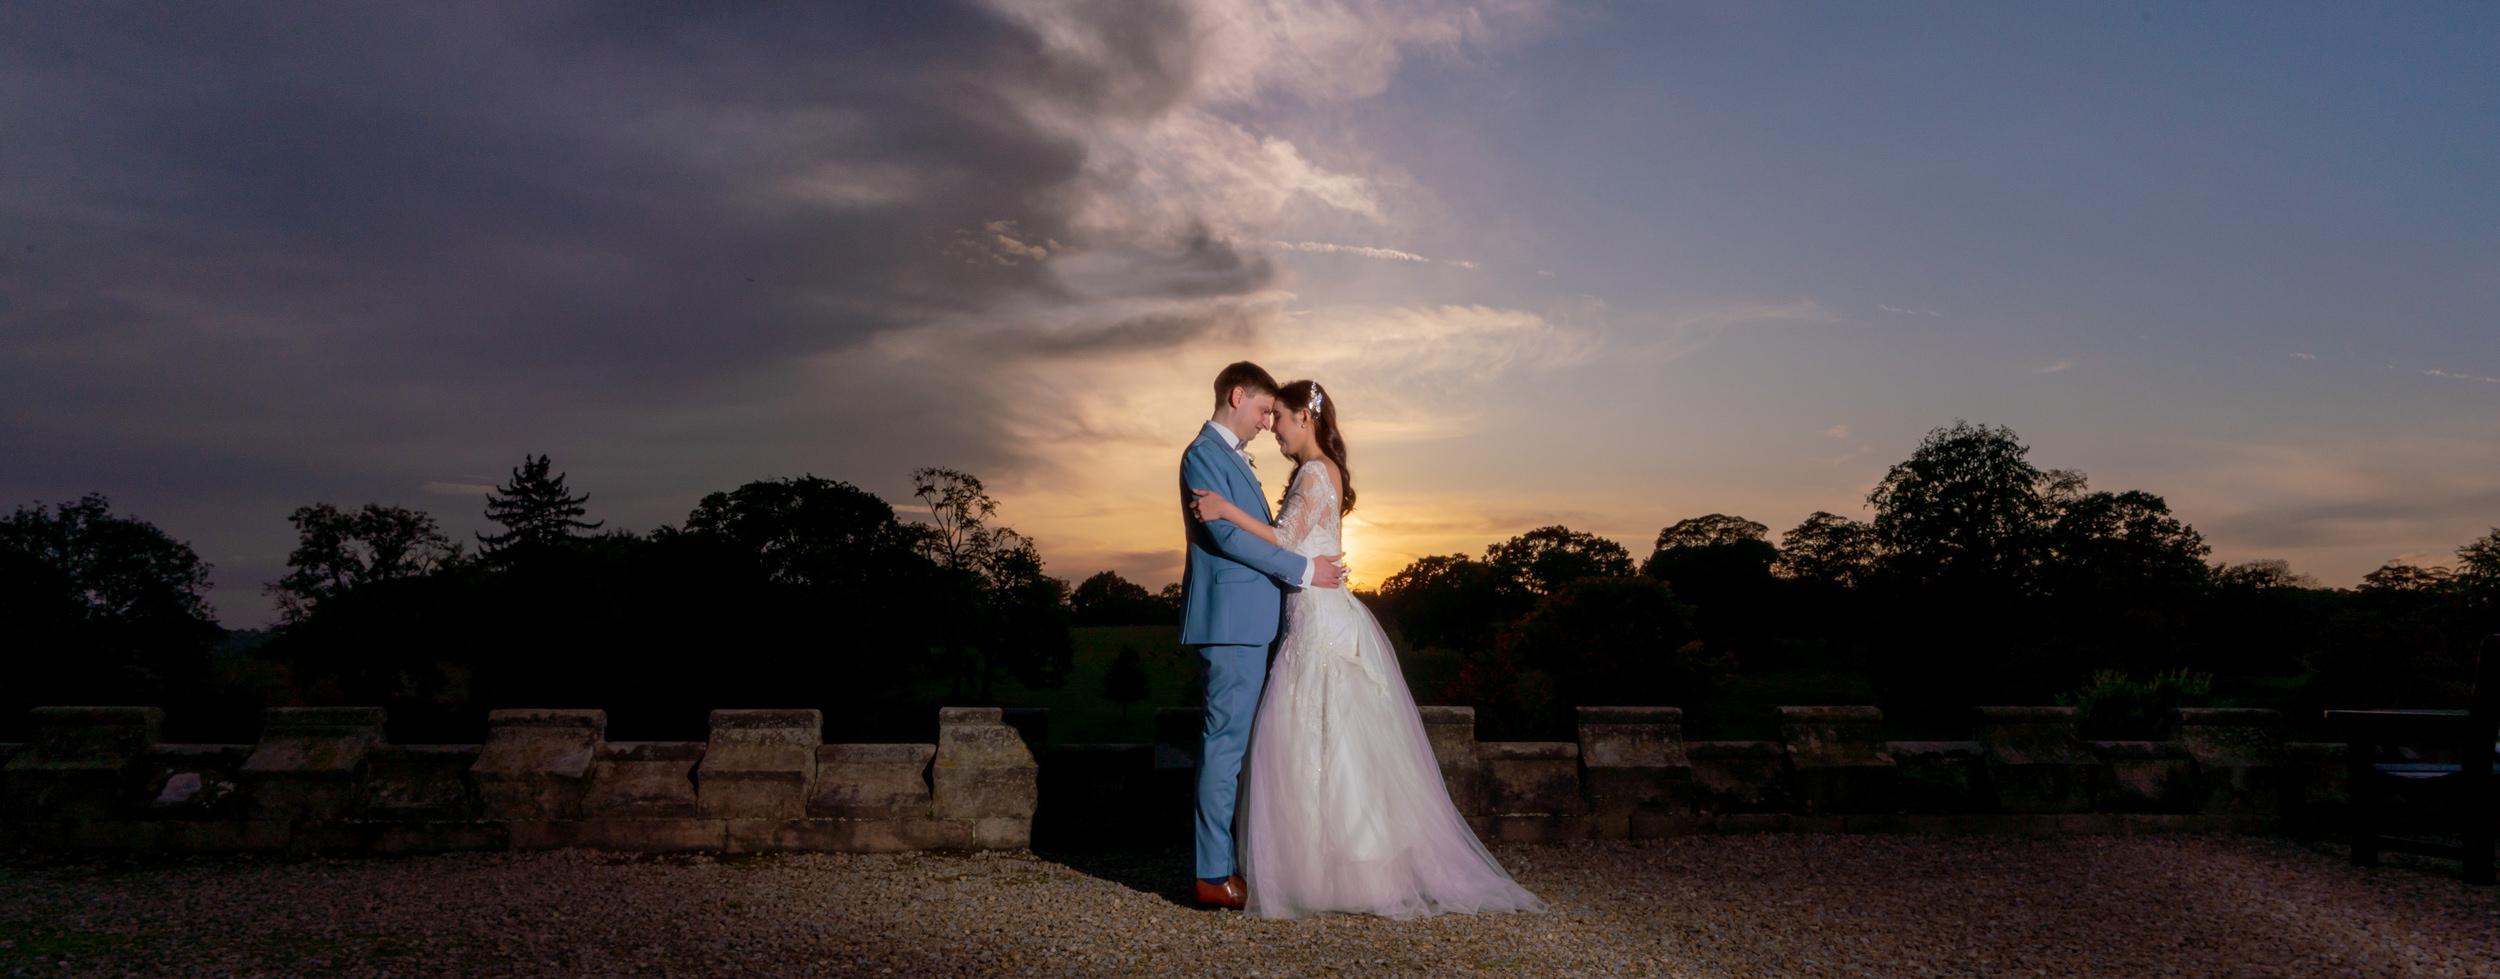 North-Yorkshire-Wedding-Photographer-Ripley-Castle-Weddings-Harrogate-York-Abraham-Photography-04